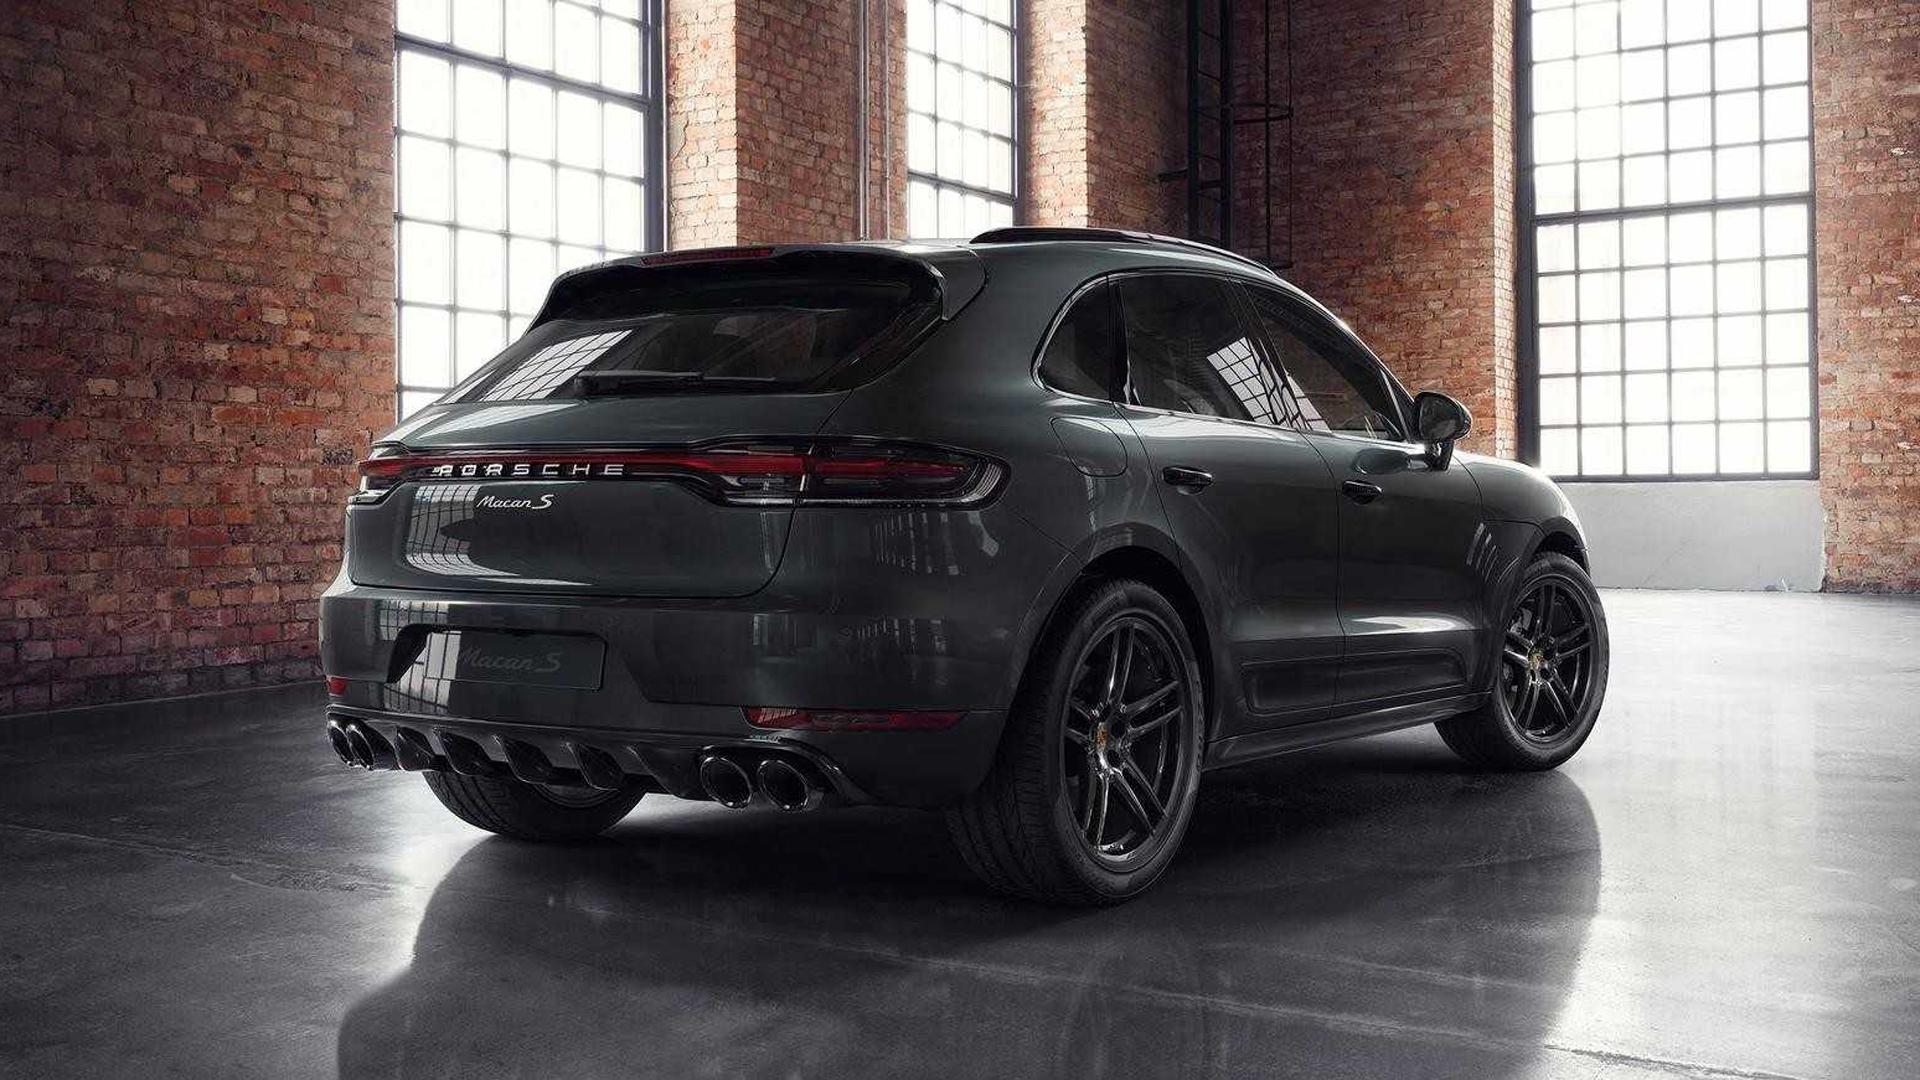 Porsche Macan S Porsche Exclusive Manufaktur